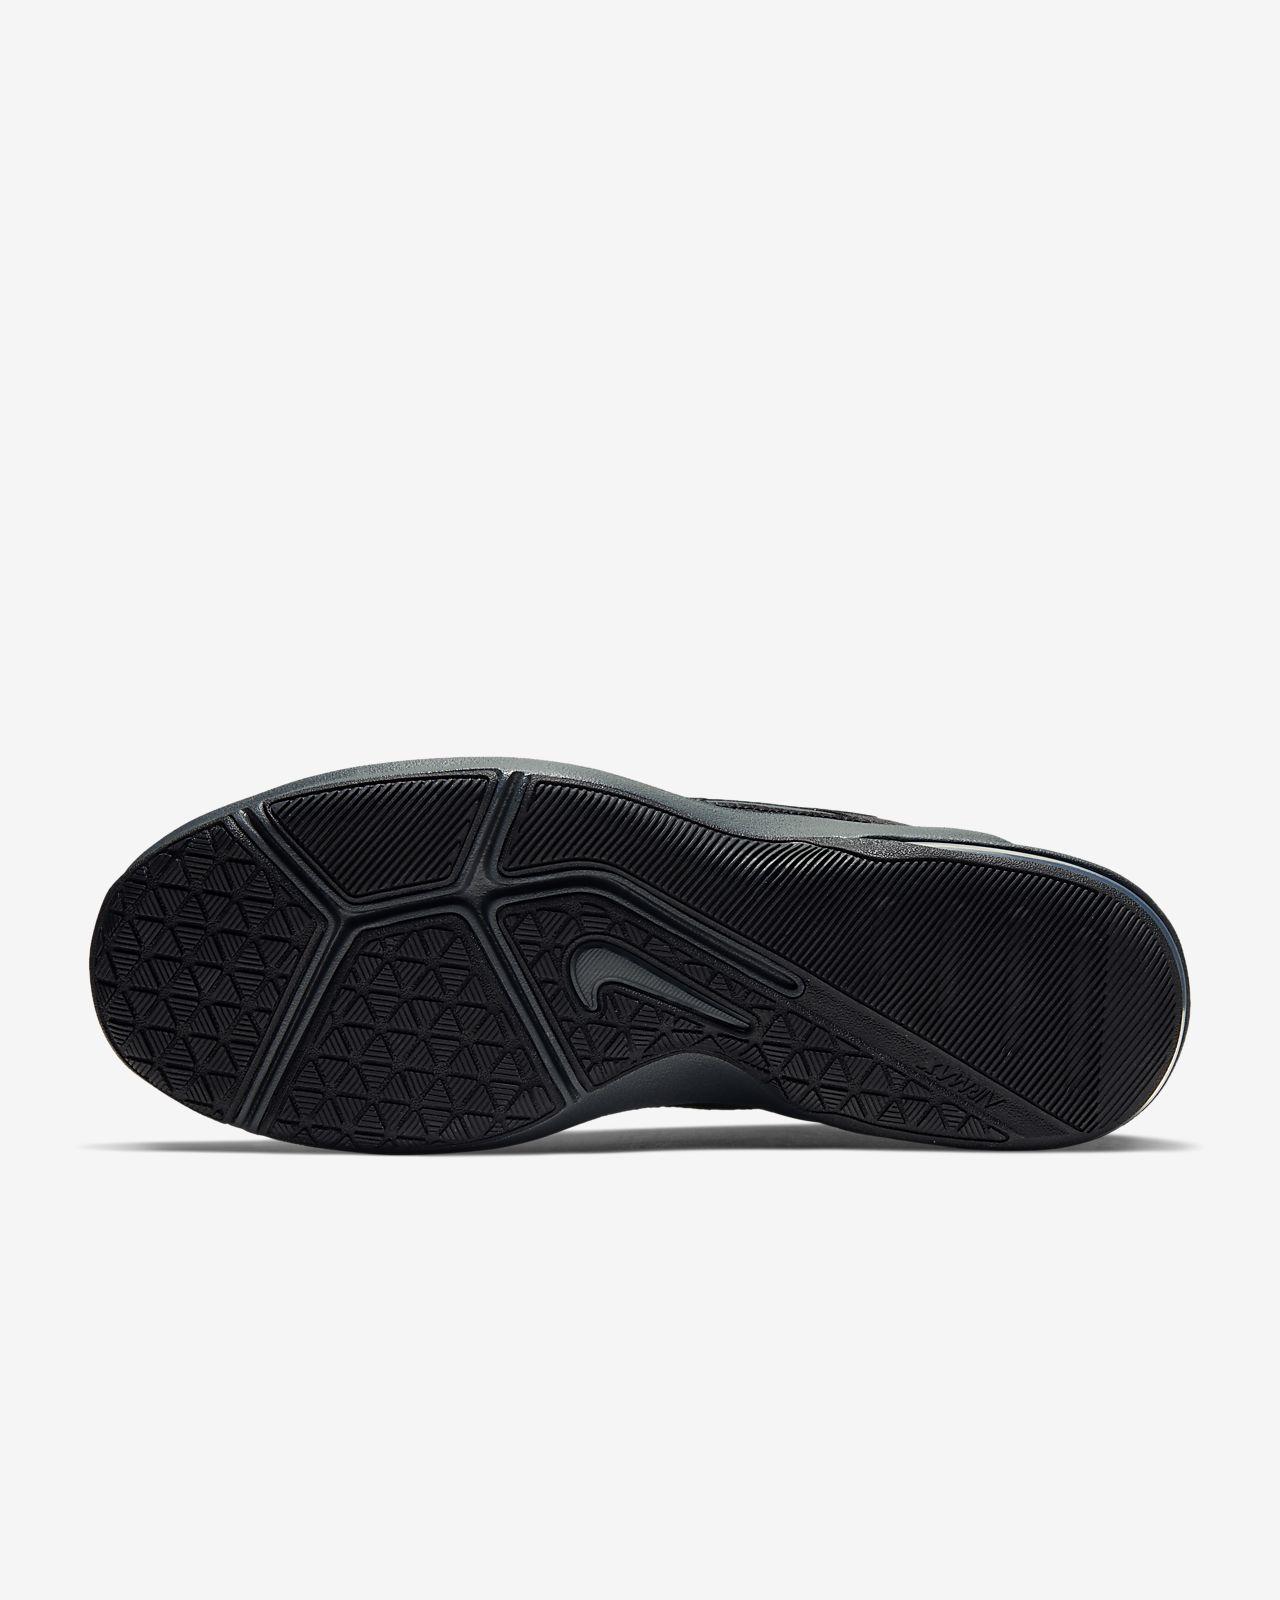 Chaussure de training Nike Air Max Alpha Trainer 2 pour Homme